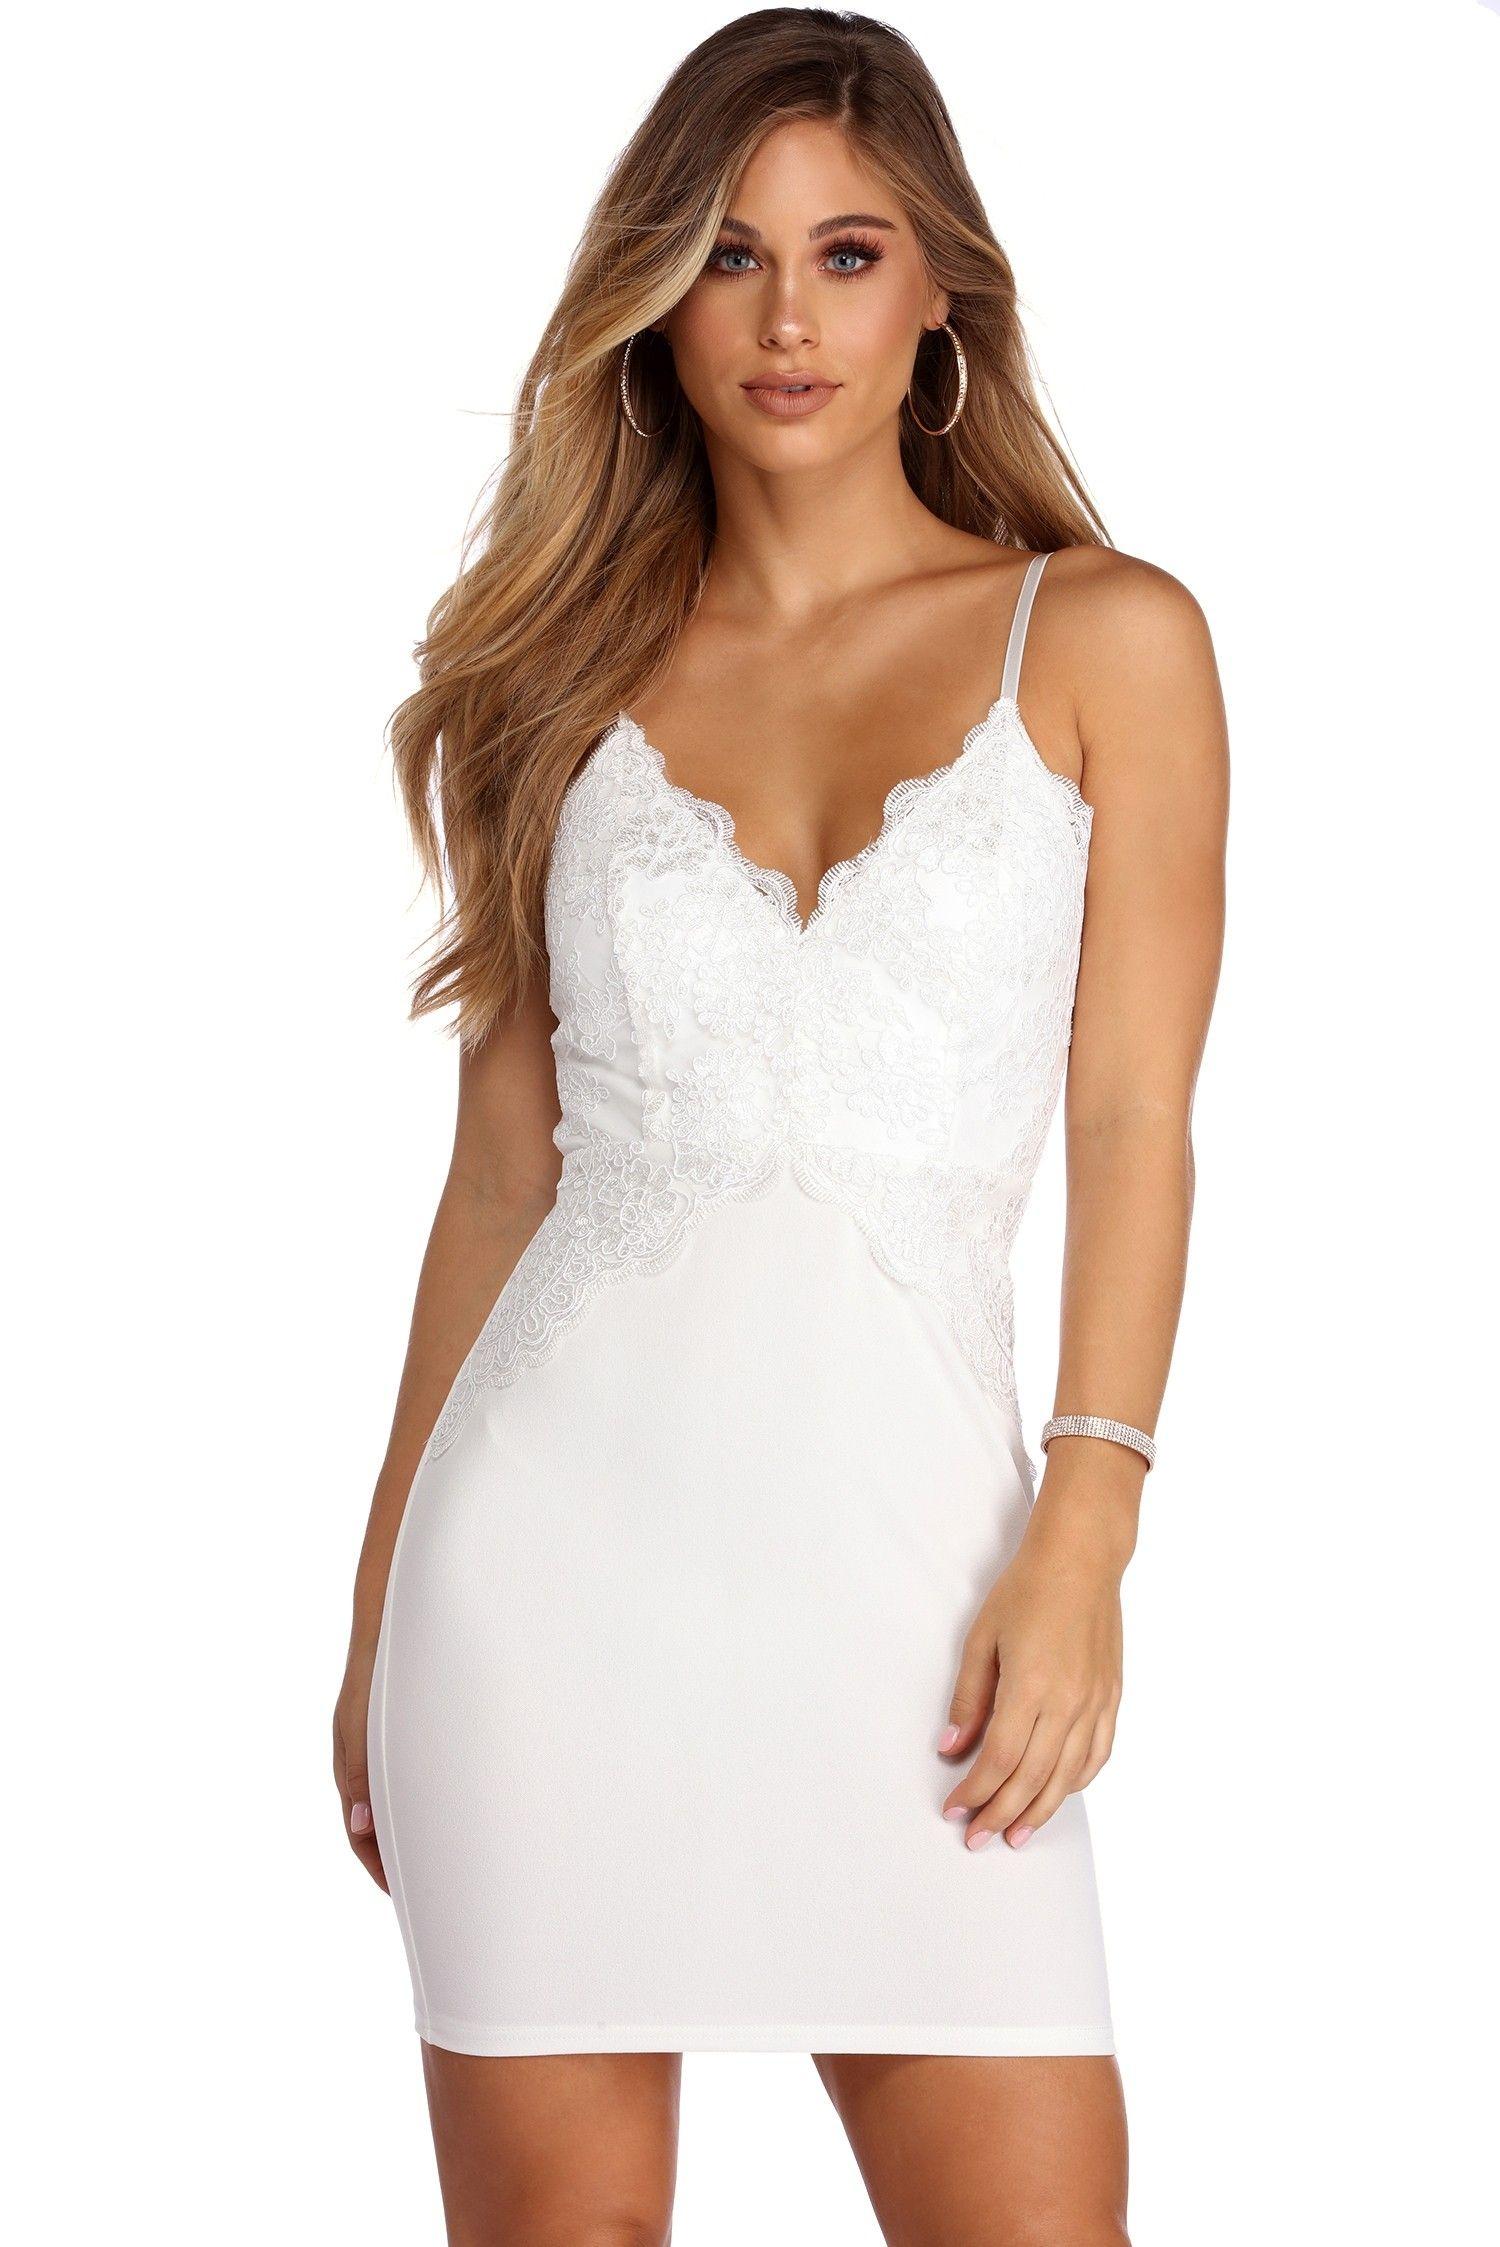 f2e33f40f98 FINAL SALE- Slip Into Sexy Dress